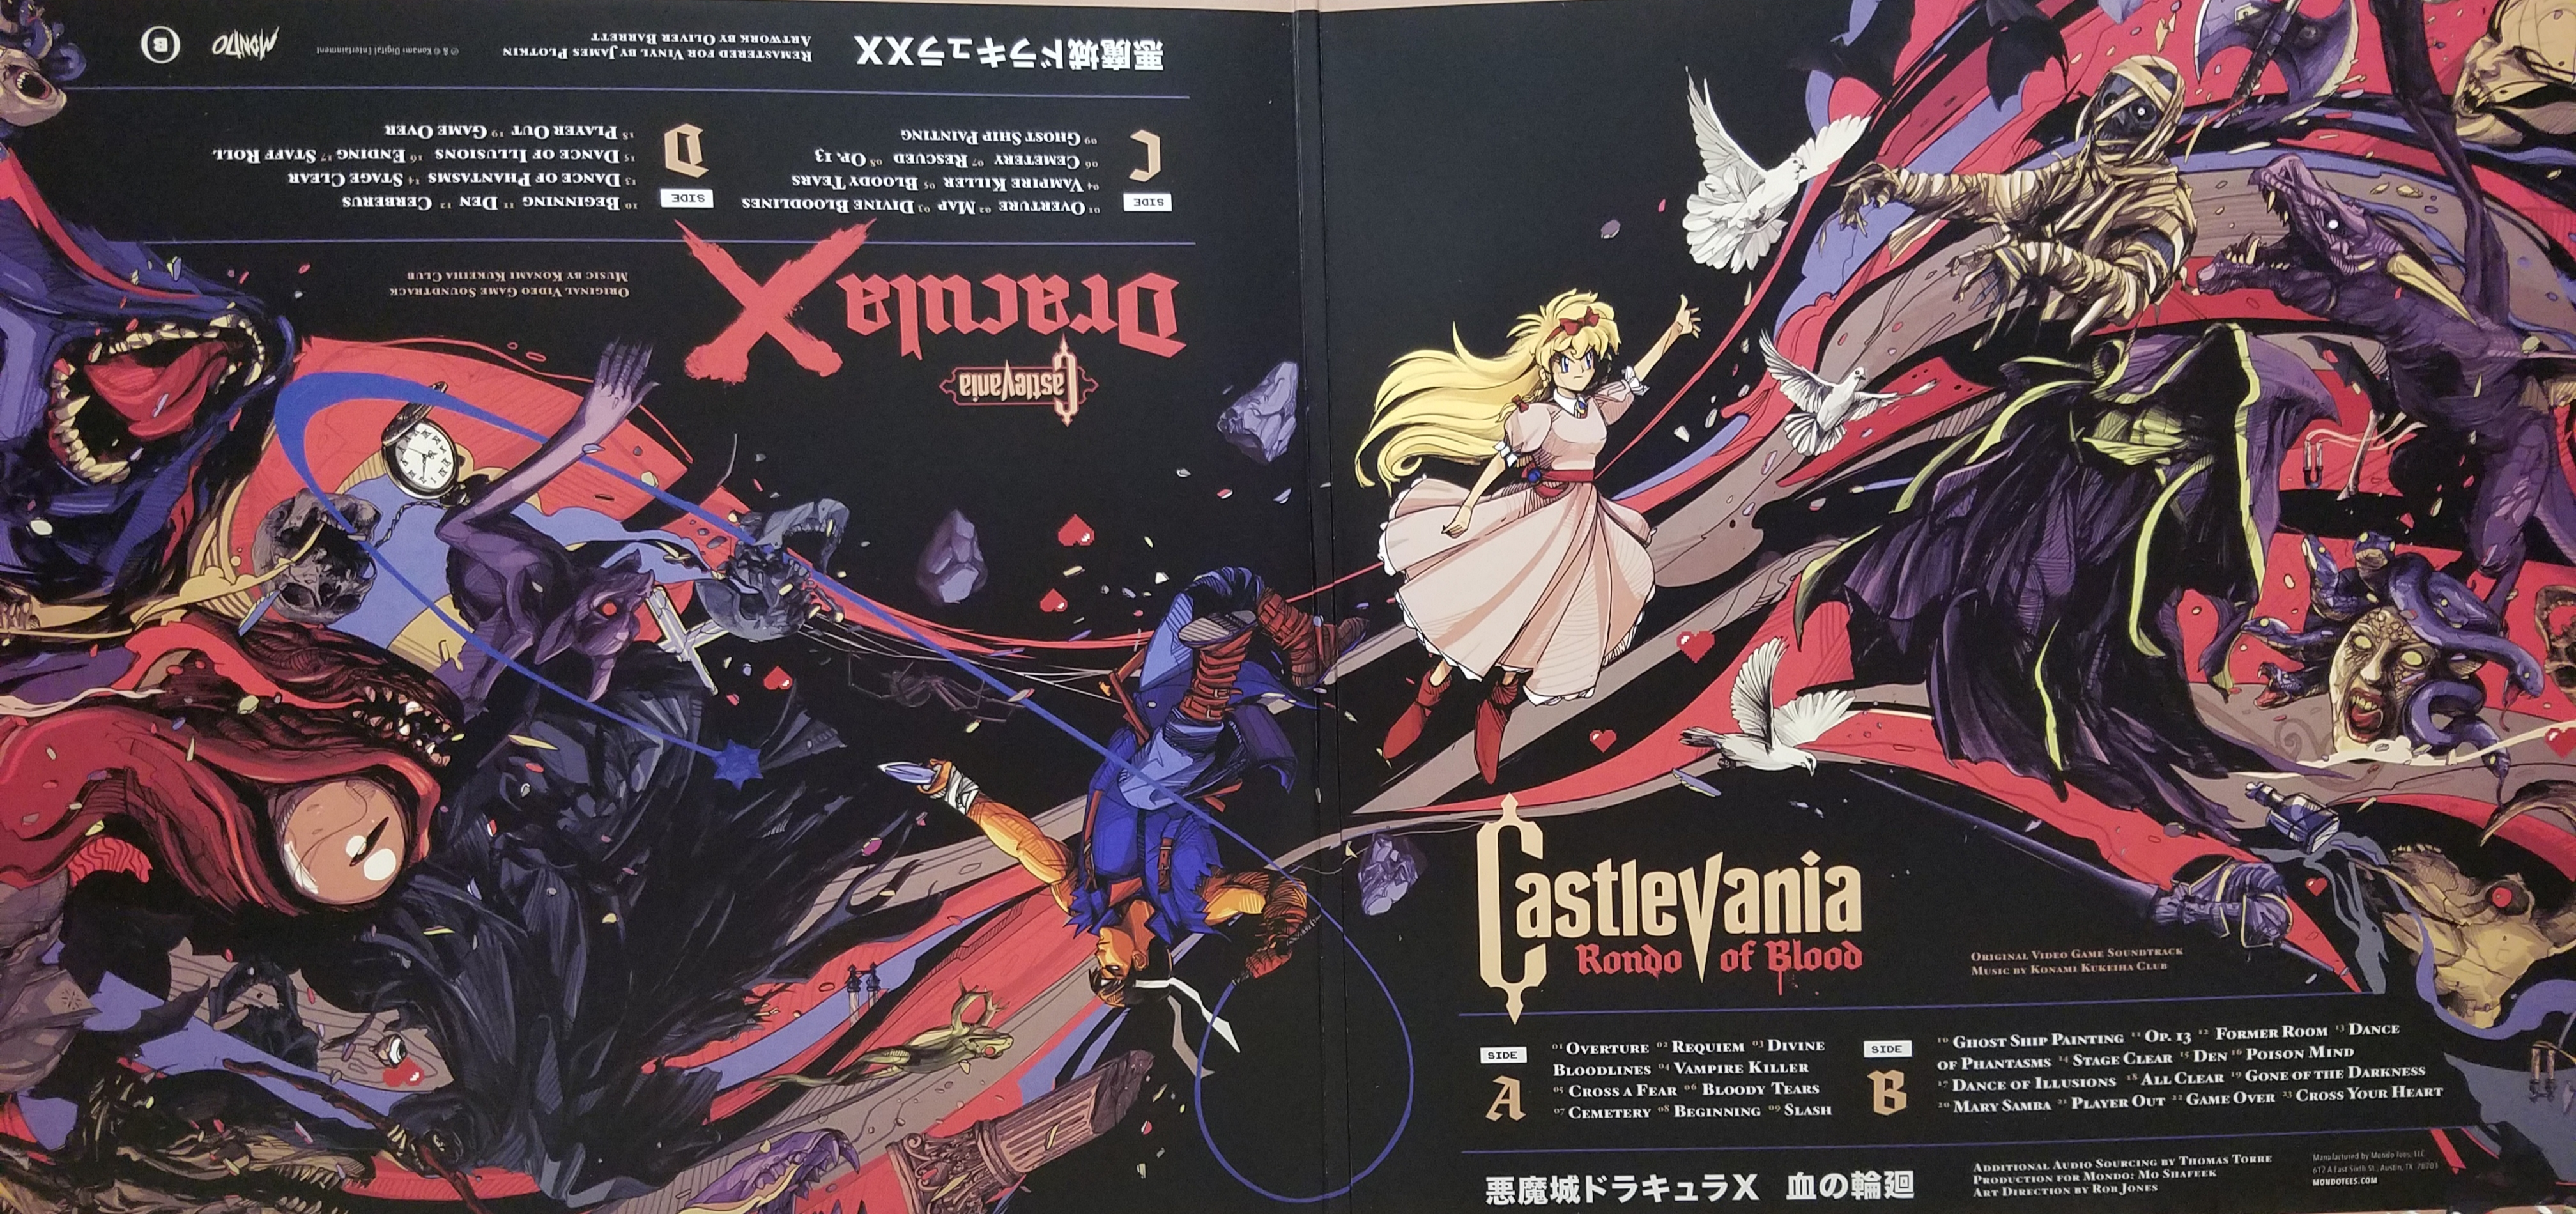 Original Sound Version Mondo of Blood - Castlevania Rondo of Blood